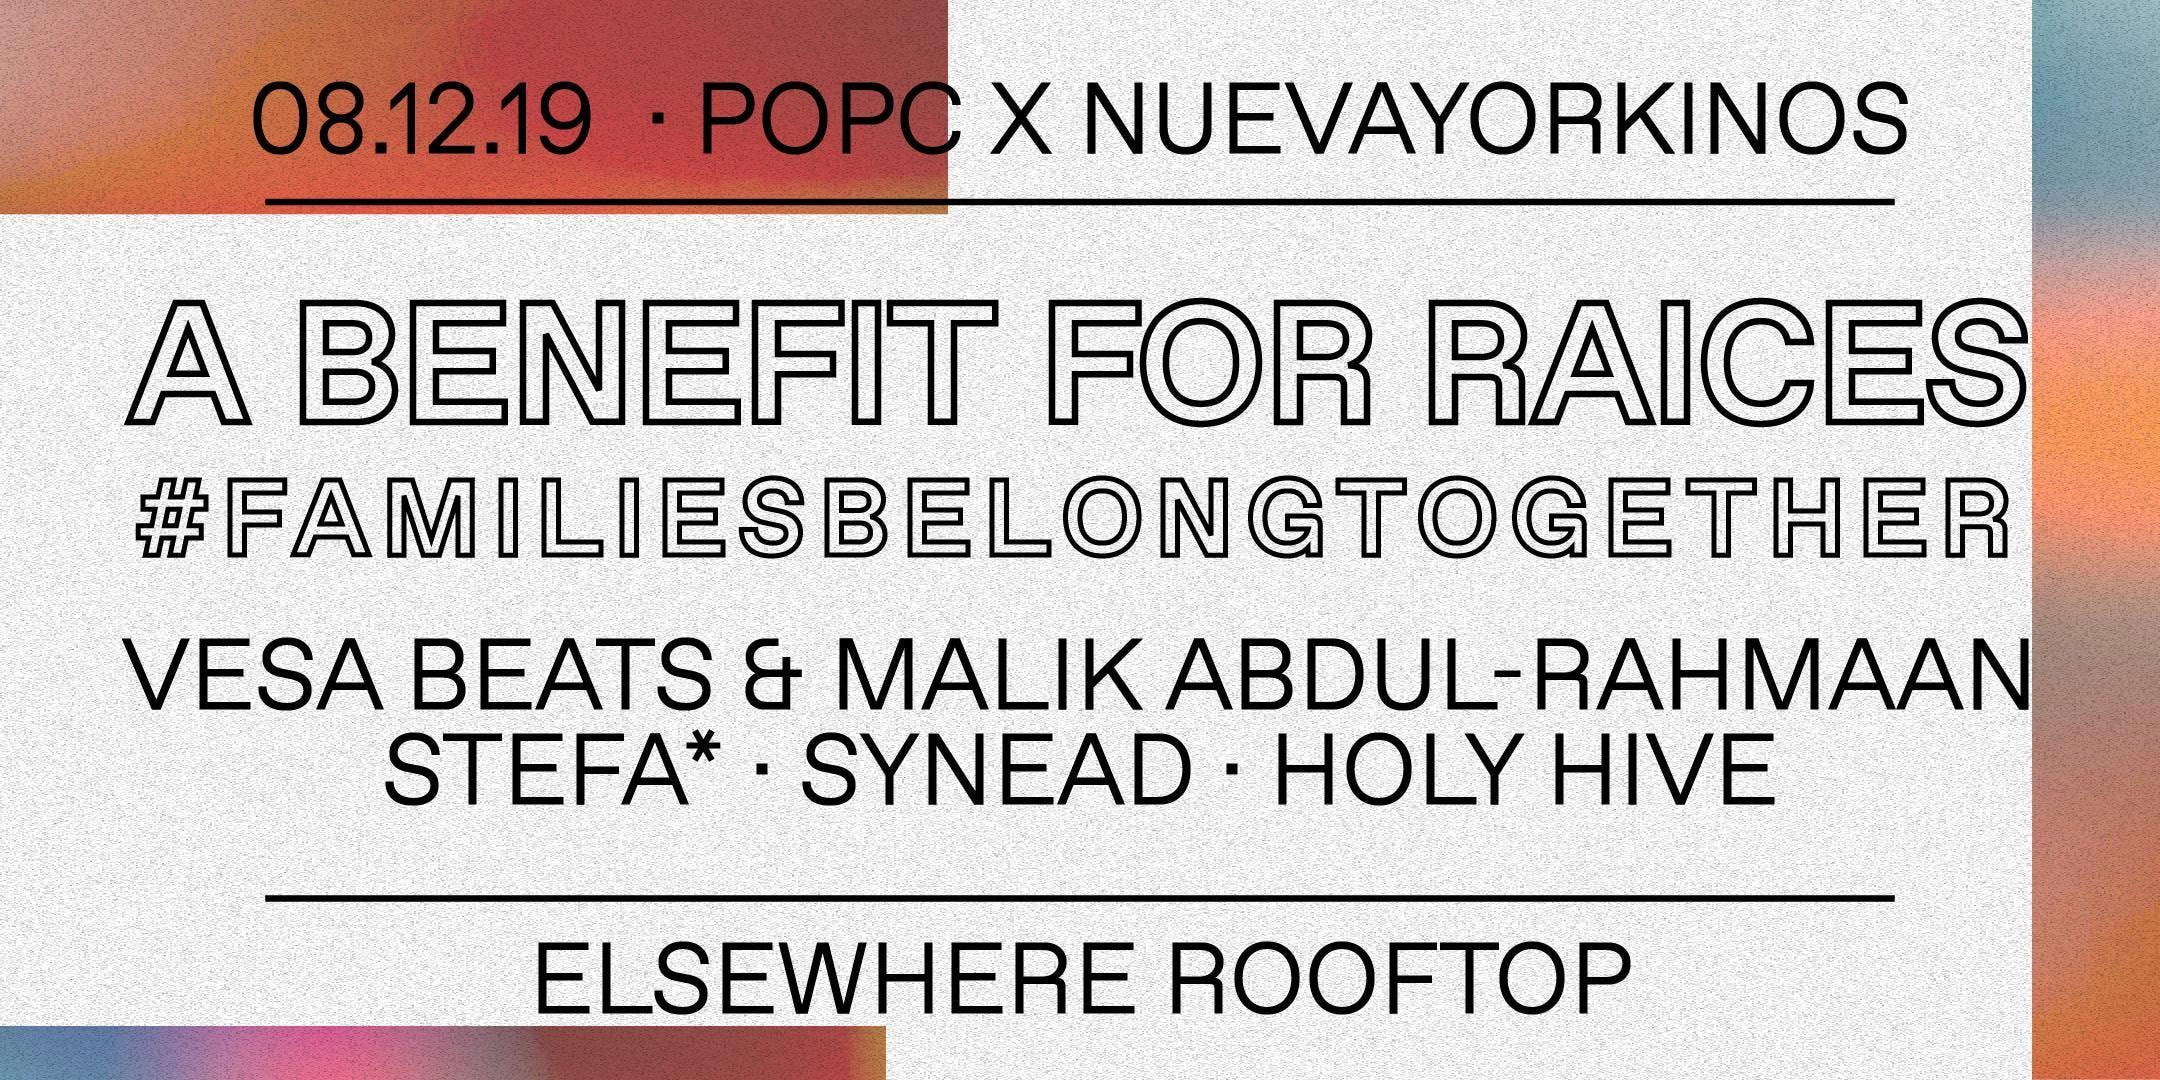 POPC & Nuevayorkinos Rooftop Party: A Benefit for RAICES